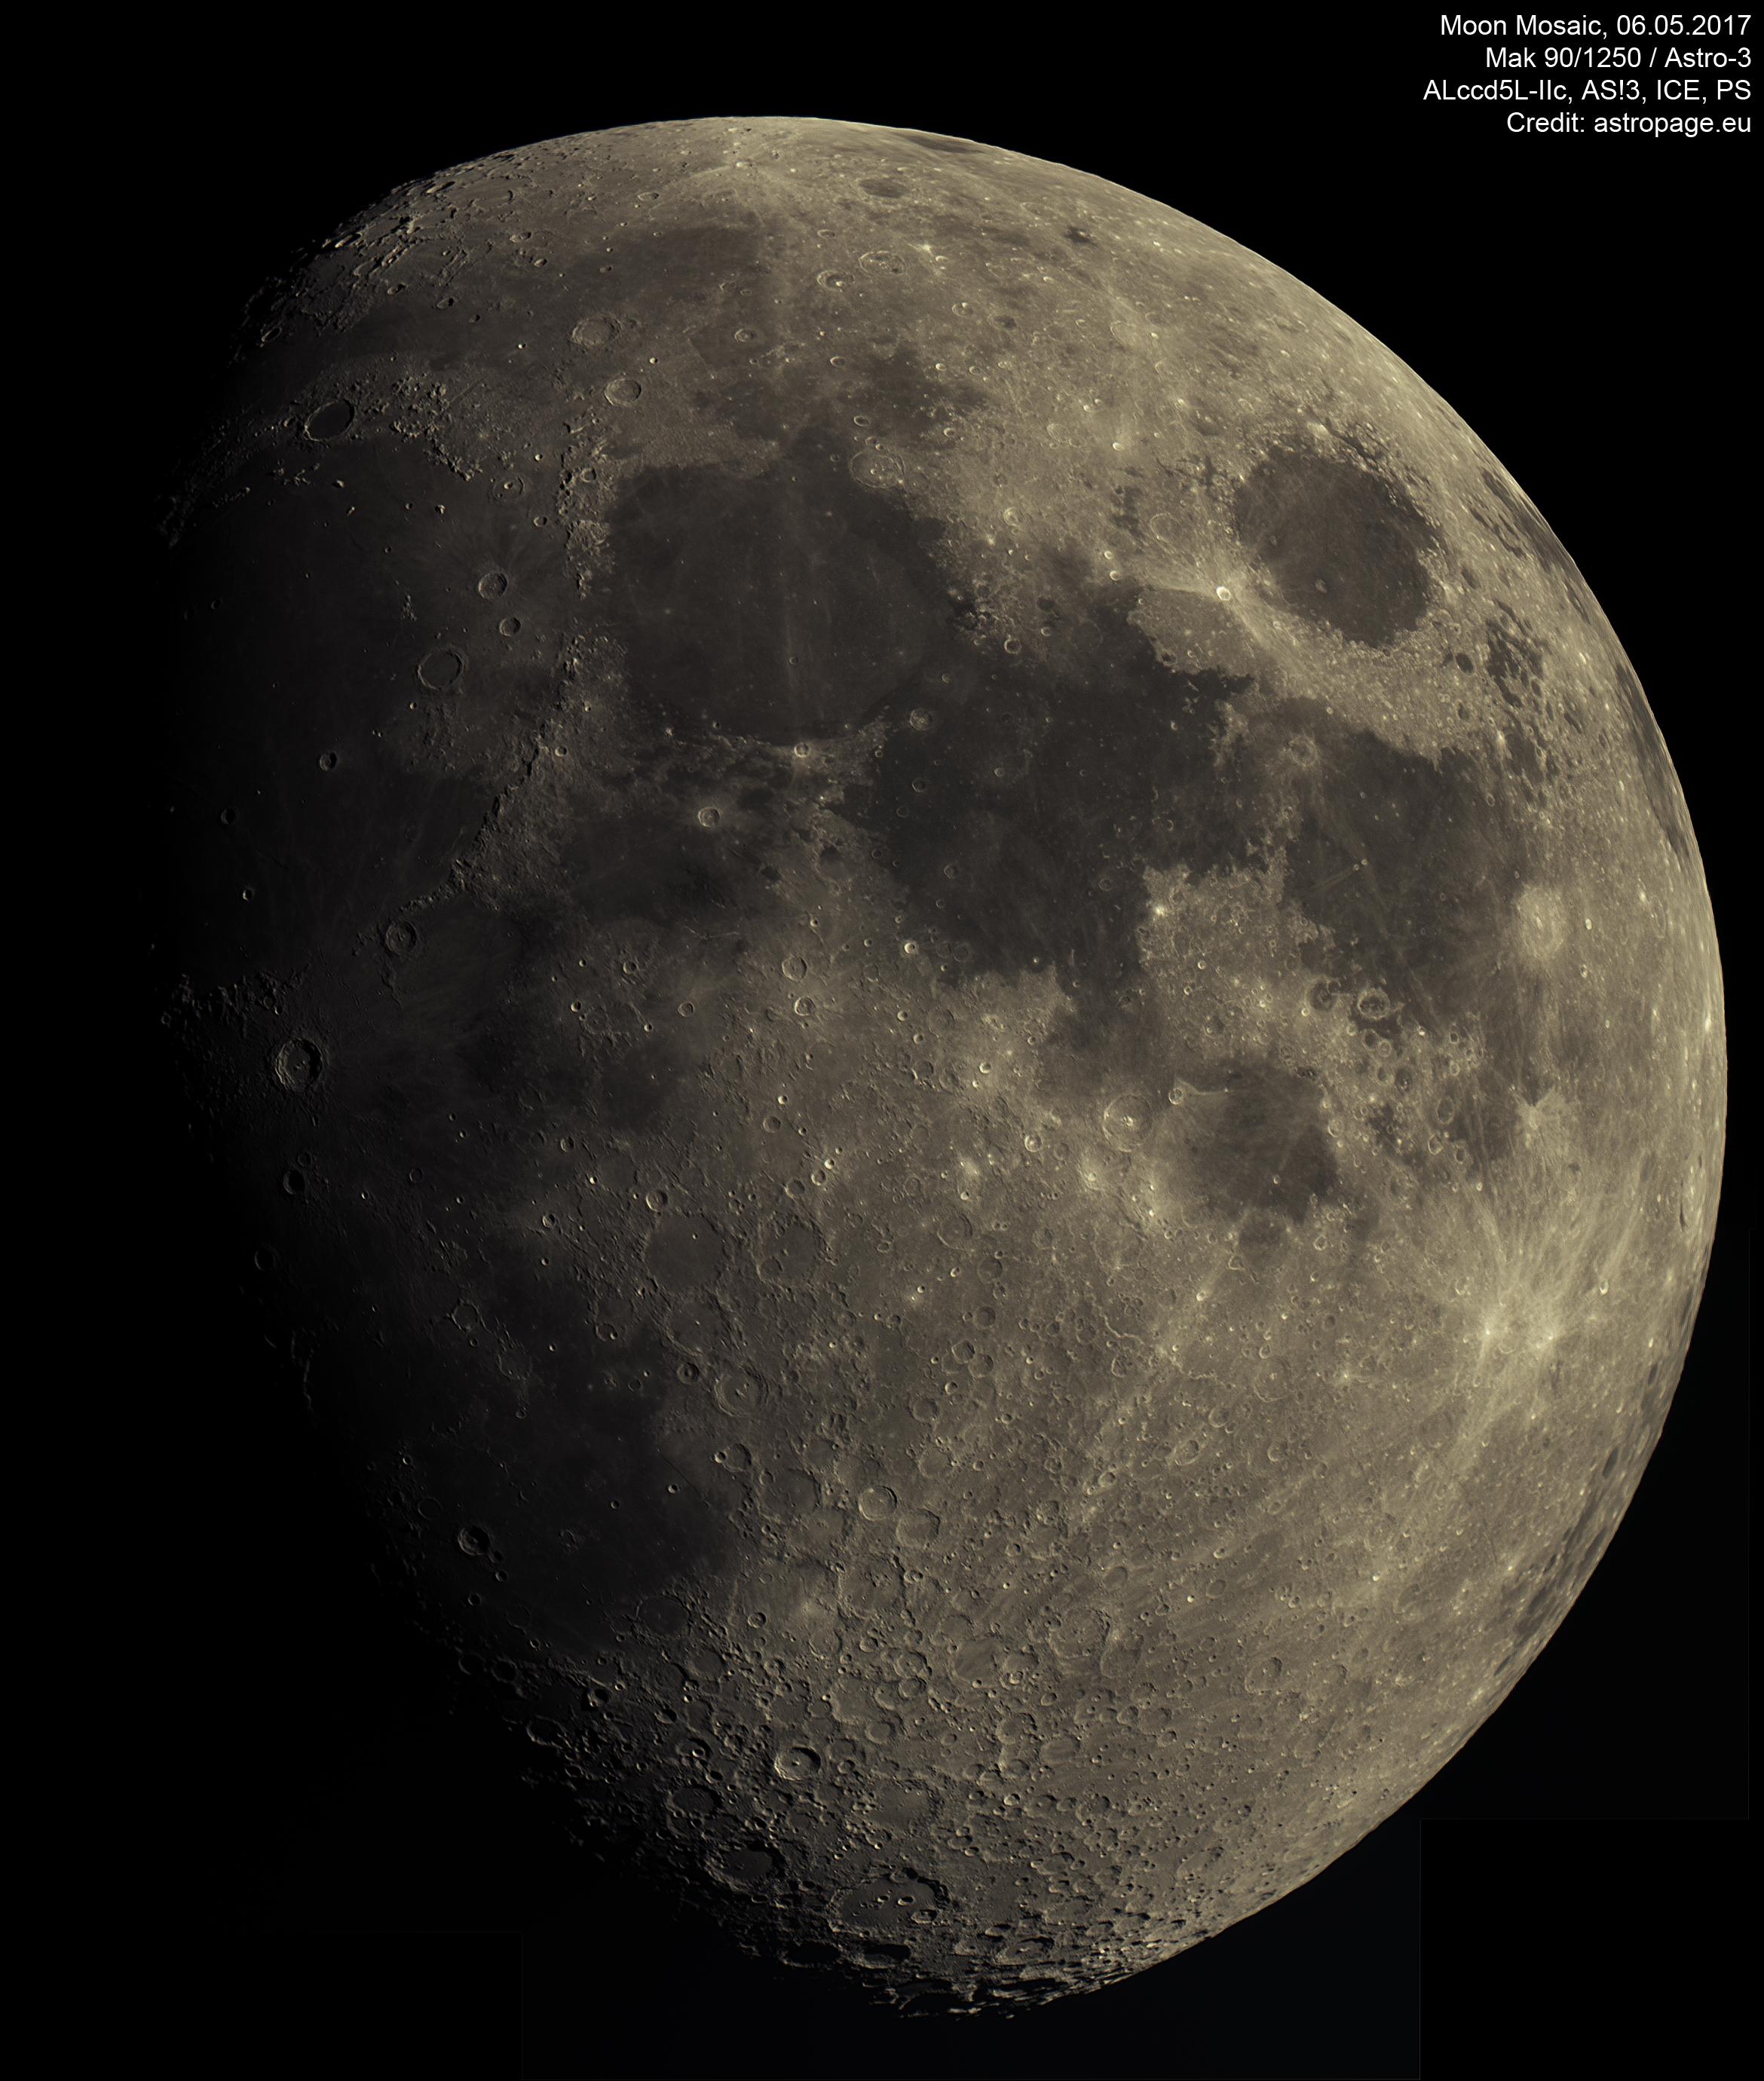 Mond Mosaik vom 6. Mai 2017. (Credit: astropage.eu)